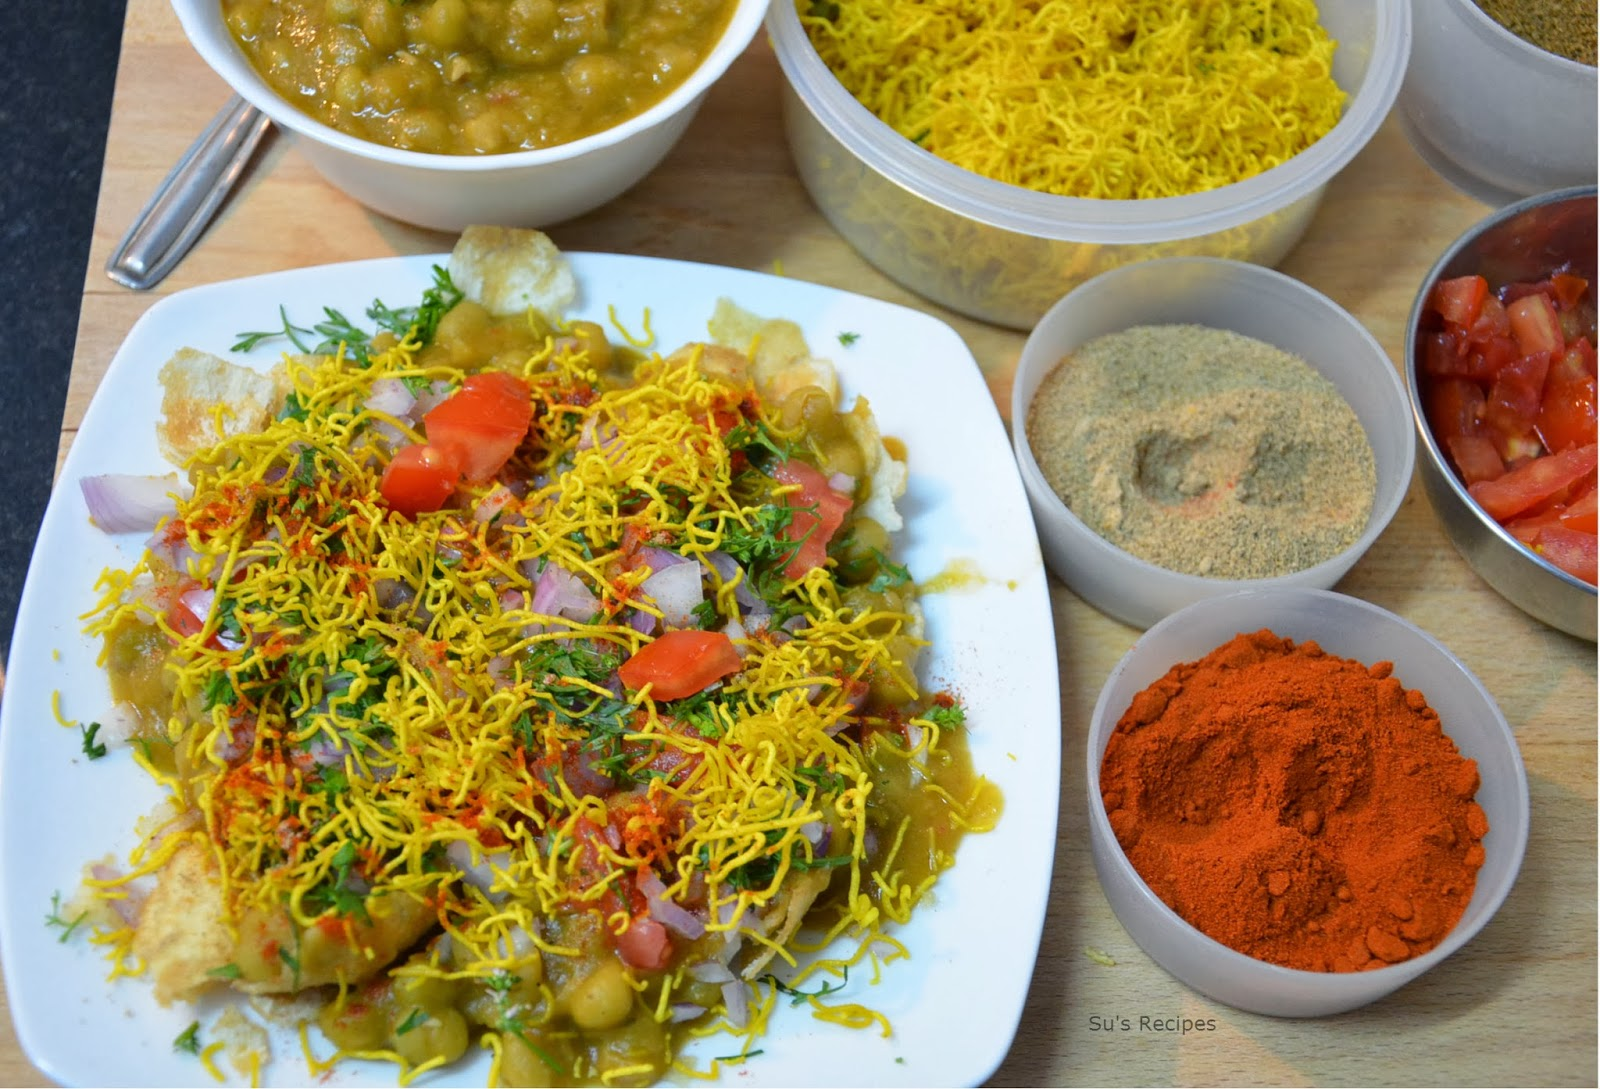 how to make masala puri chaat, how to assemble chaats, masala puri recipe